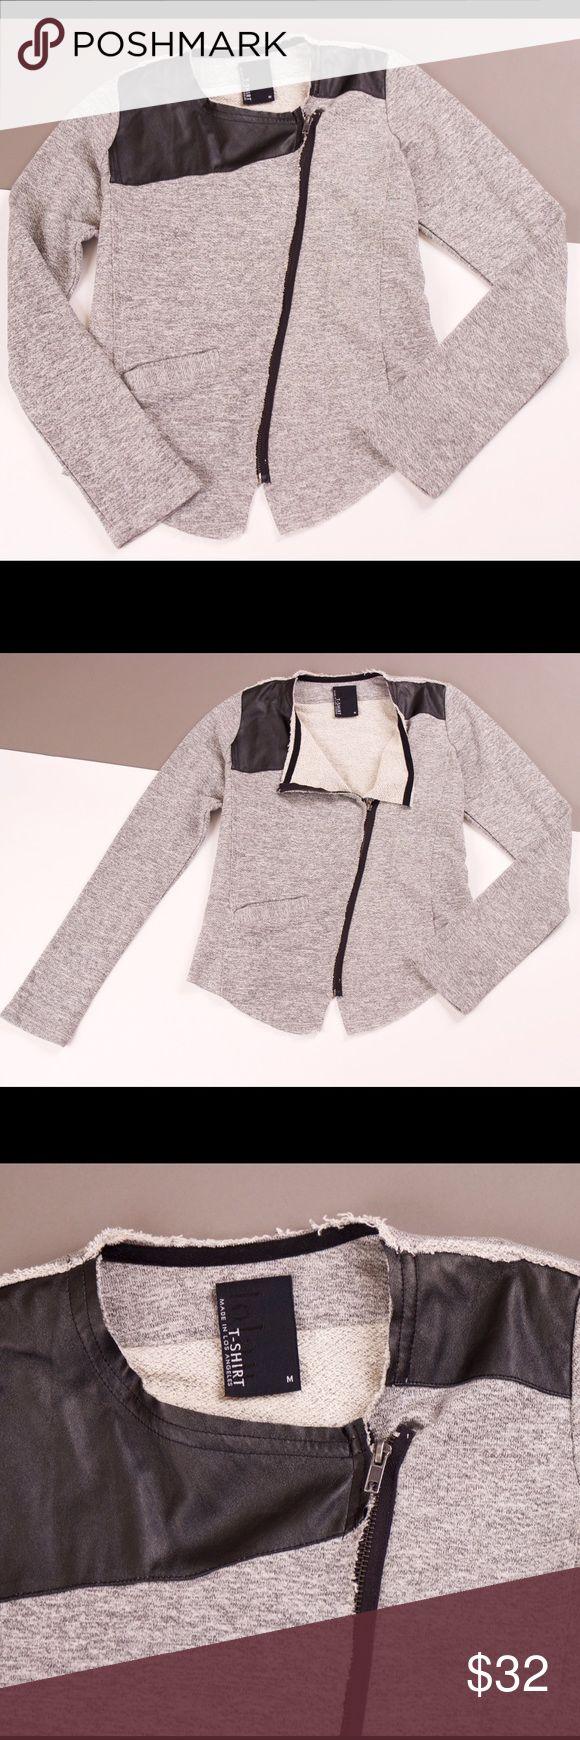 Dolan Left Coast gray black moto jacket Dolan left coast (t-shirt) gray moto jacket with faux leather shoulder detail. Zips up the front with asymmetrical zipper. Front pocket. Light cotton blend. Size medium   Shoulder-14 Sleeve-25 Bust-34 Length-26 dolan left coast Jackets & Coats